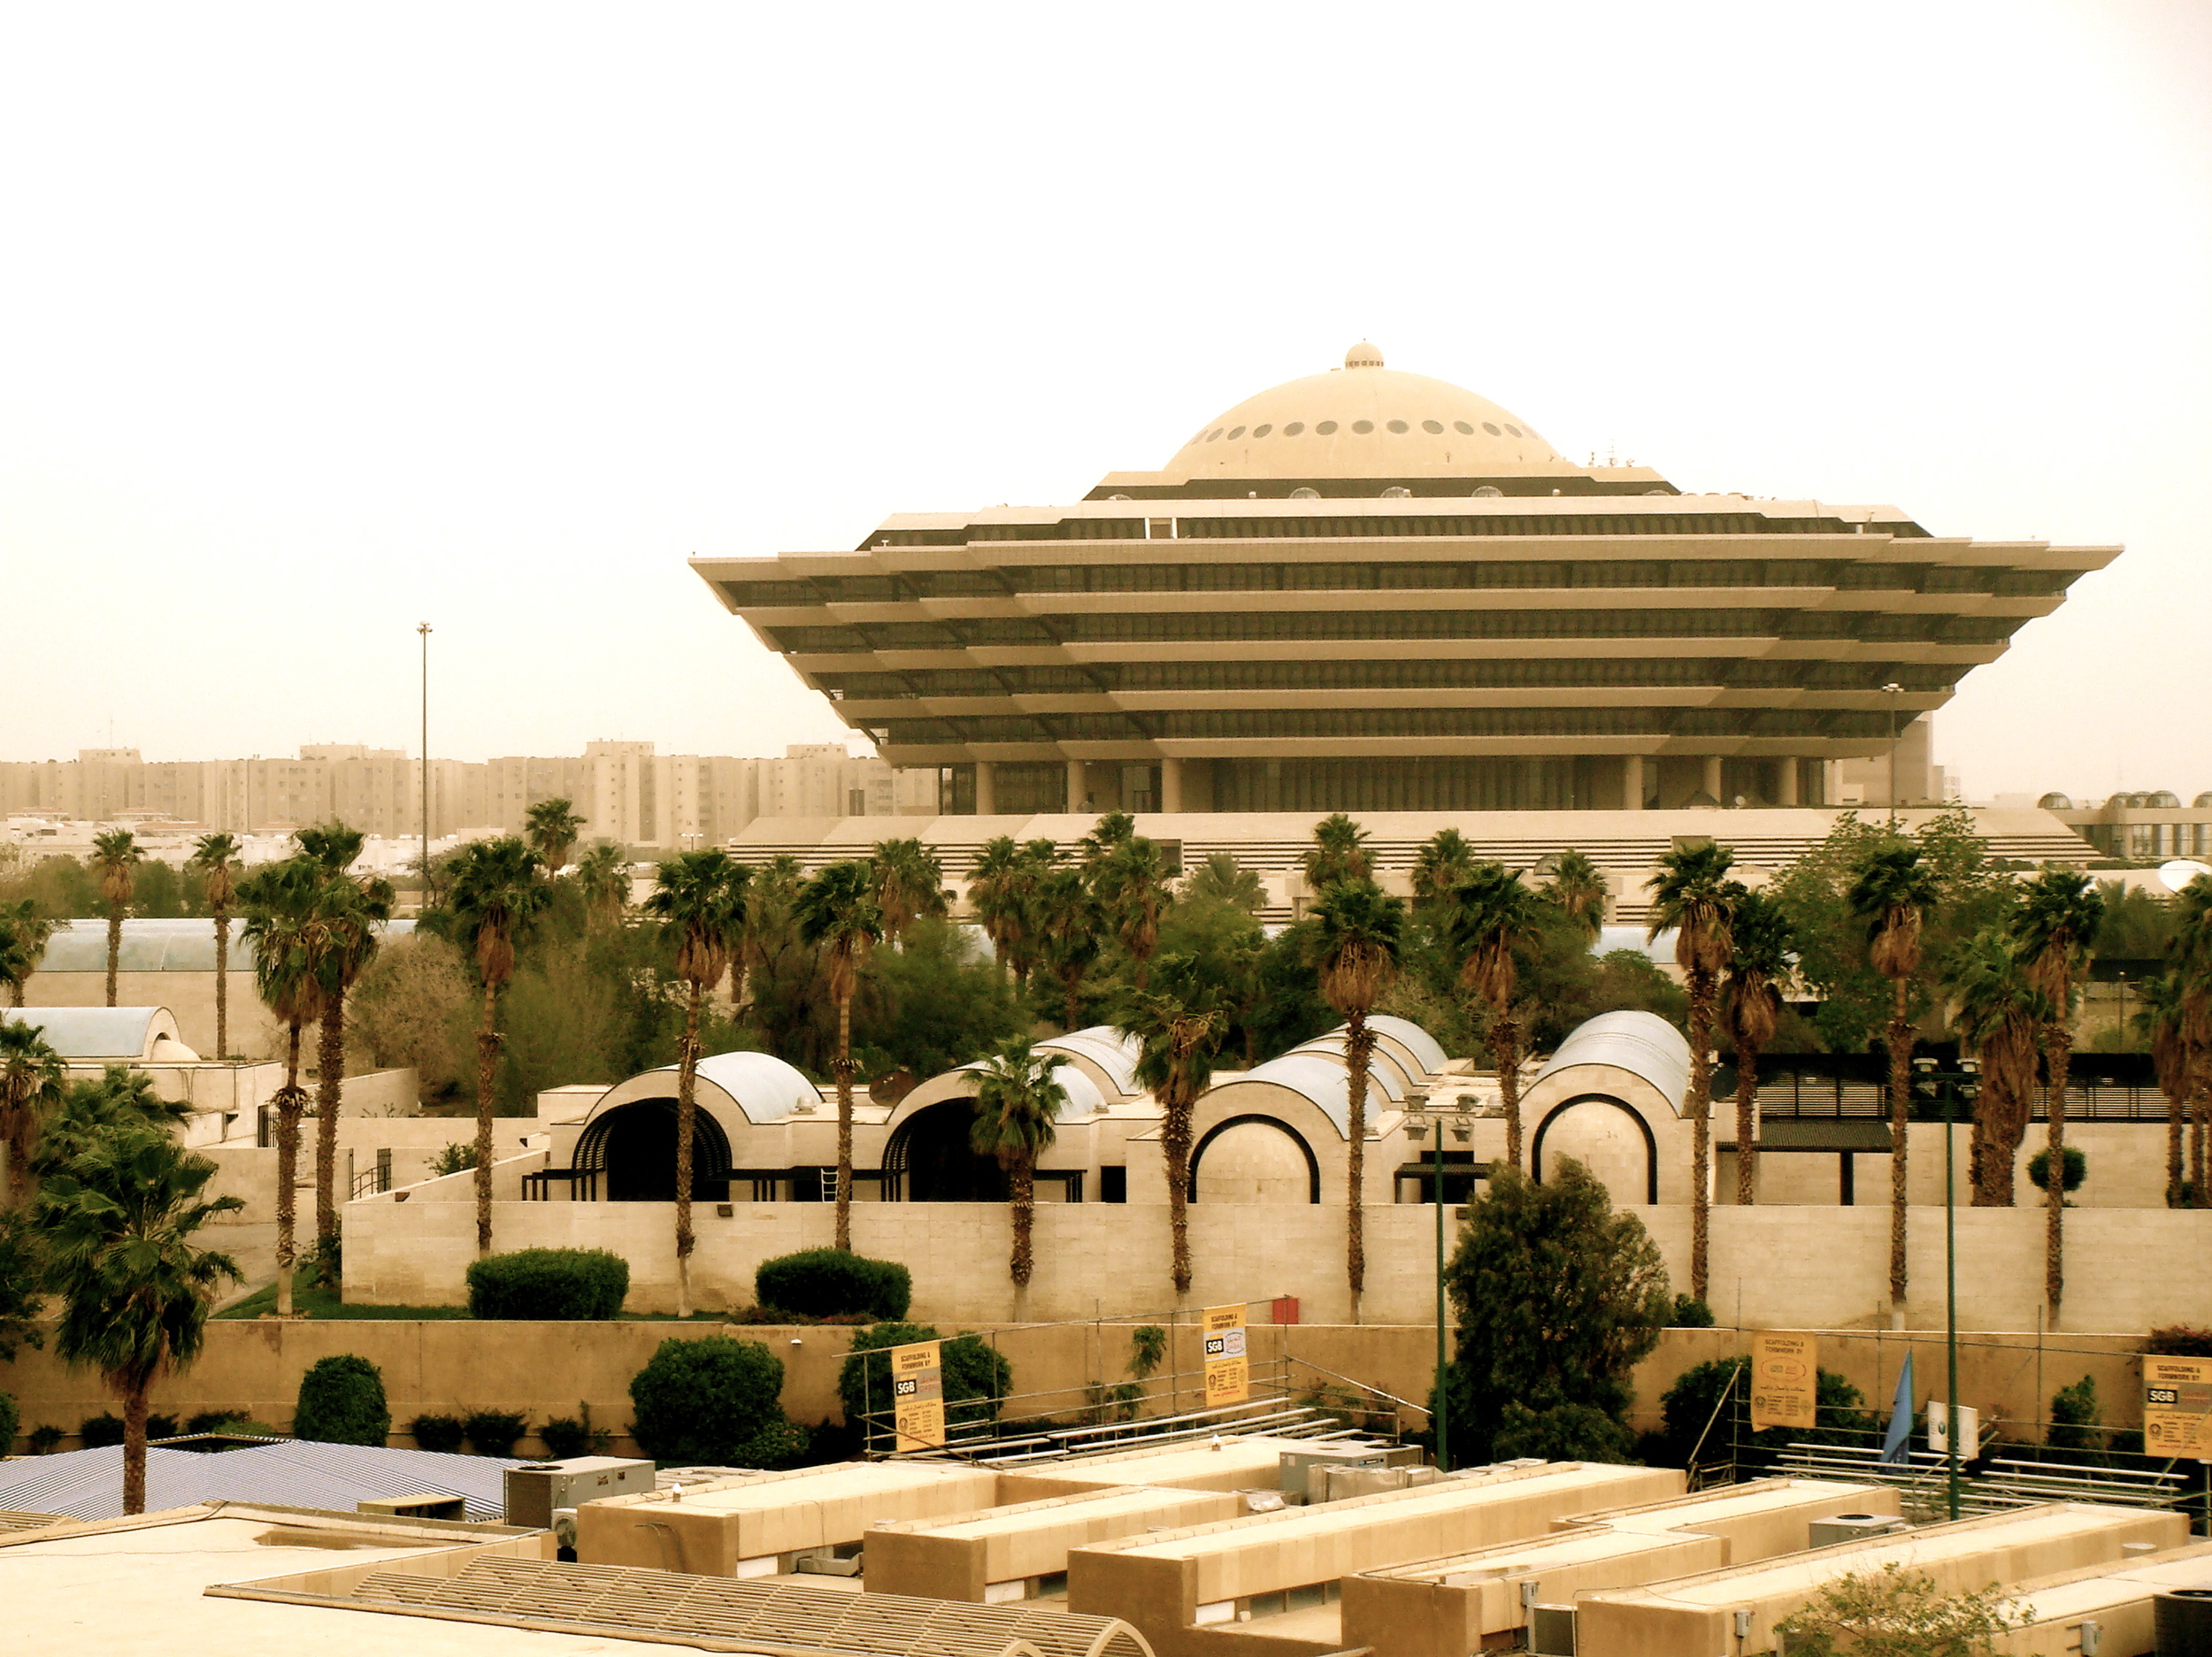 Innenriksdepartementet i Riyadh.Jon Rawlinson, Flickr Commons.